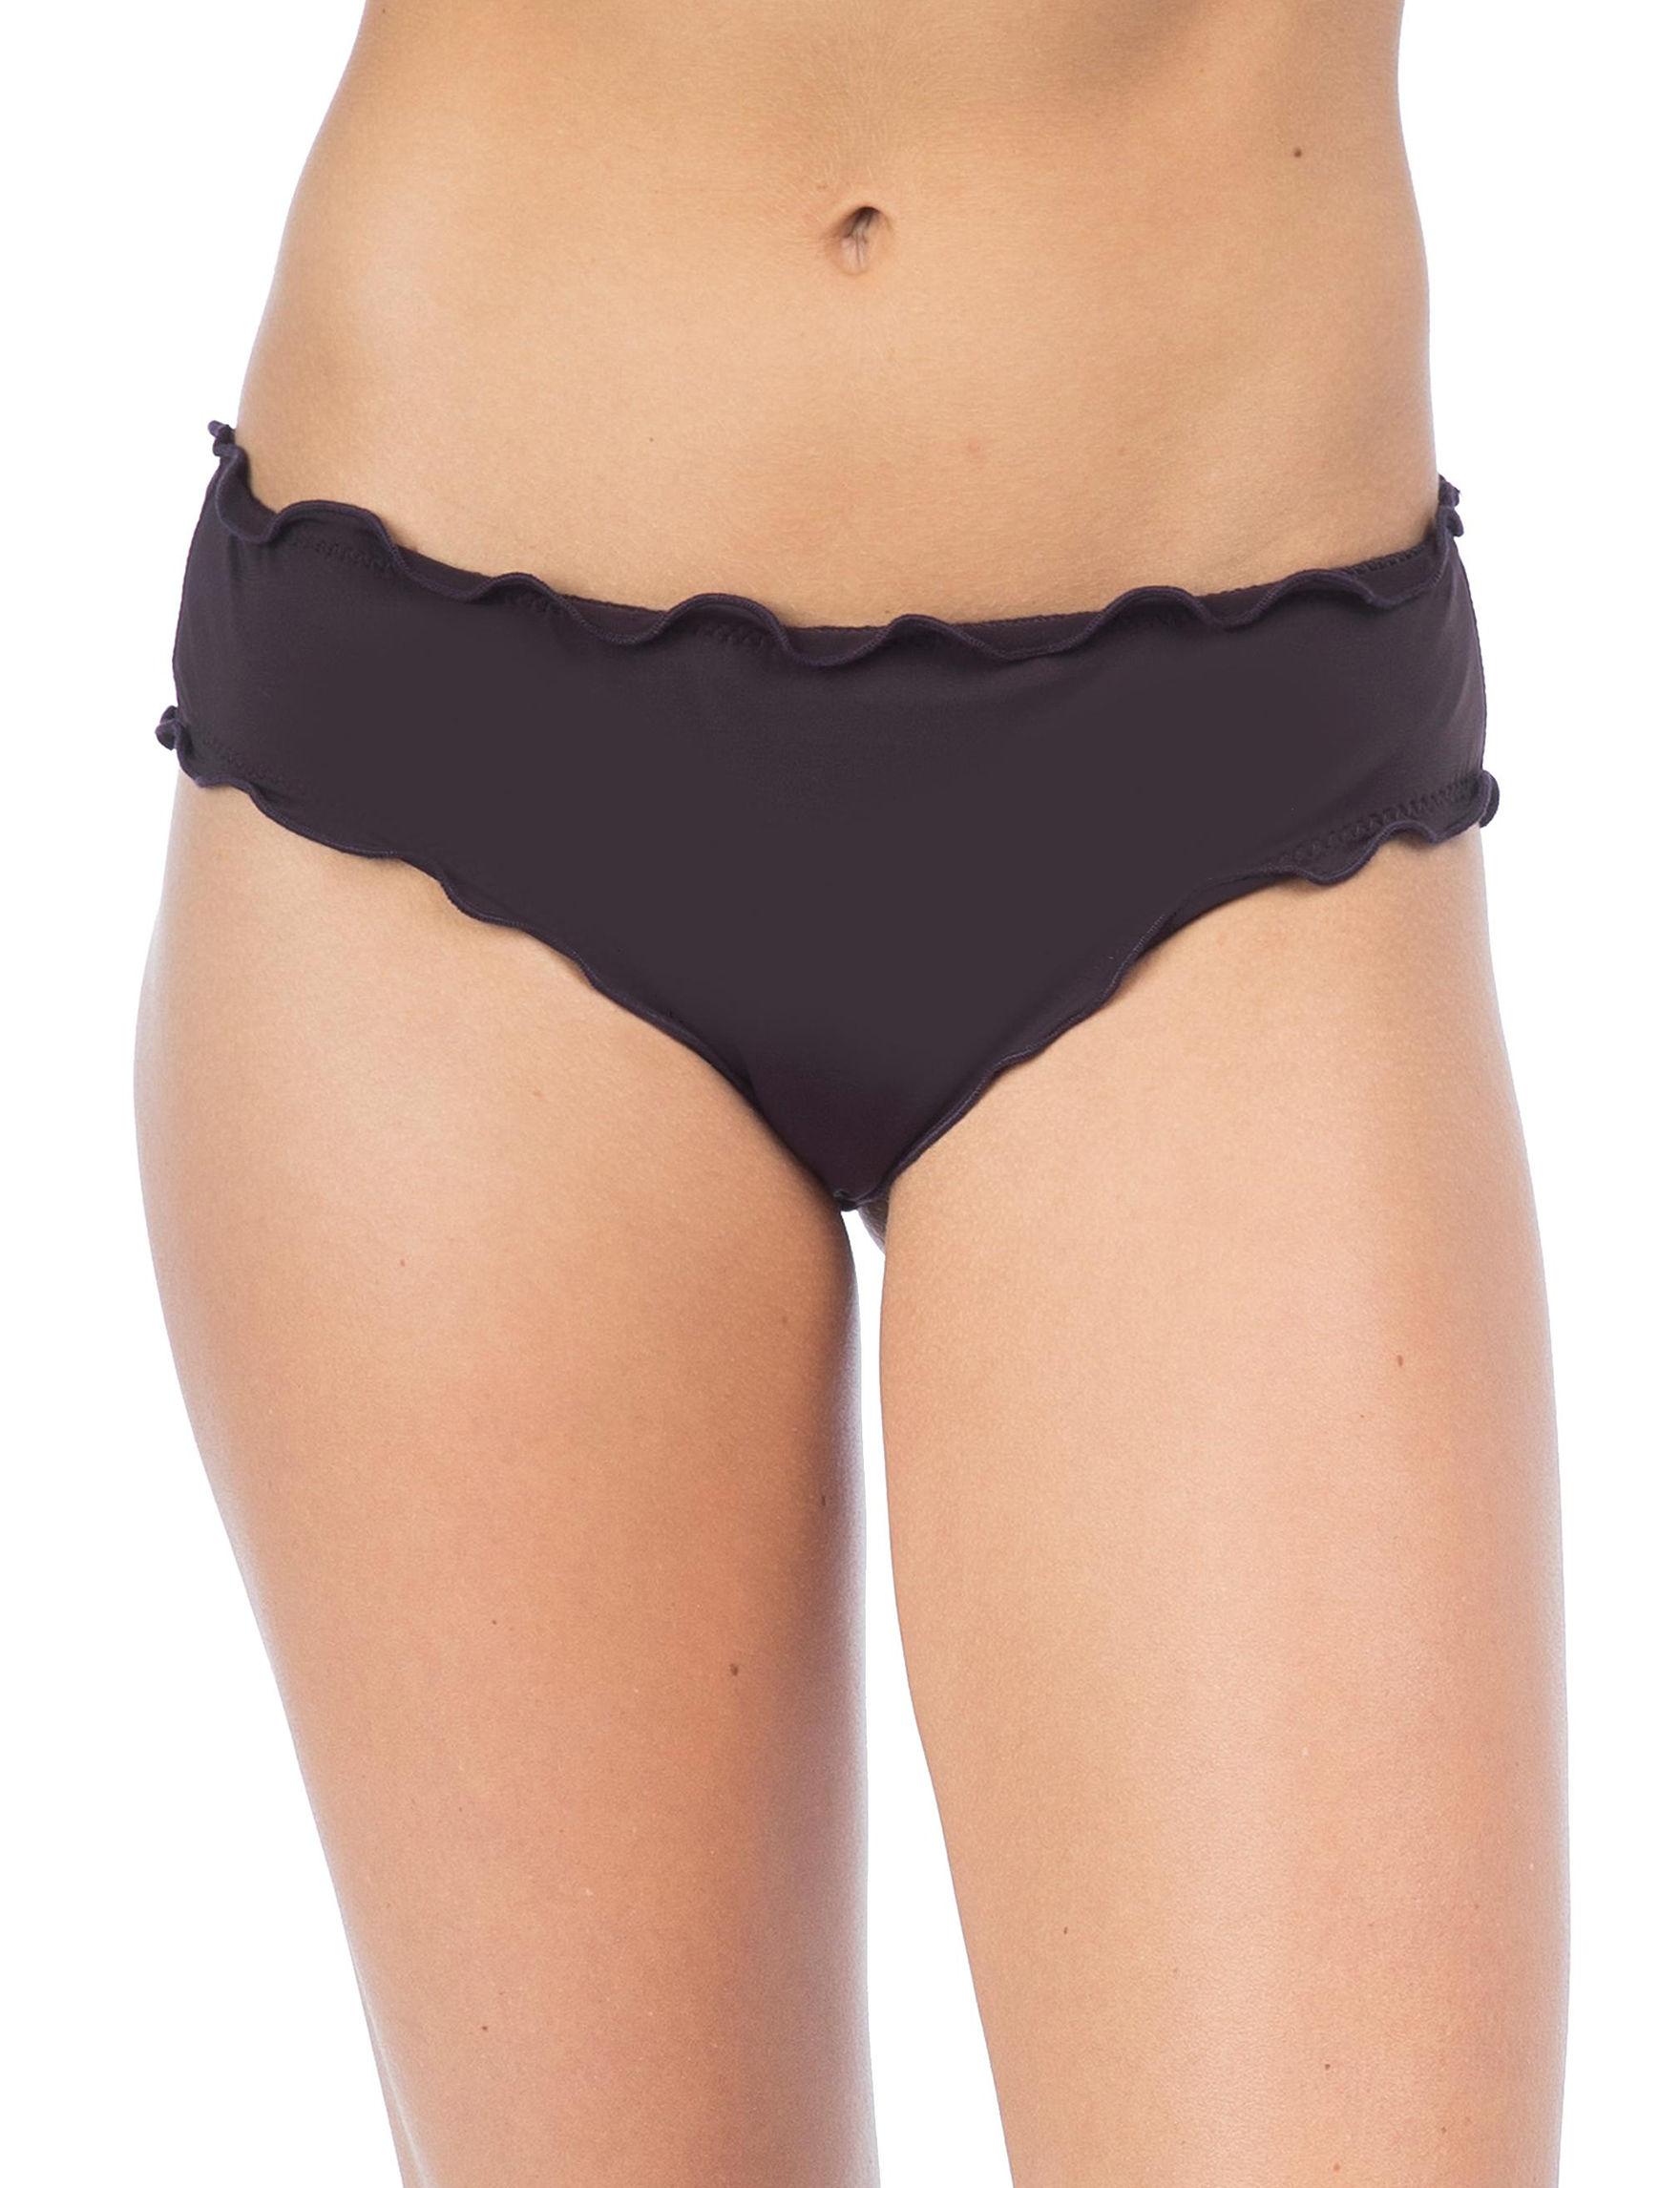 Hobie Black Swimsuit Bottoms Hipster